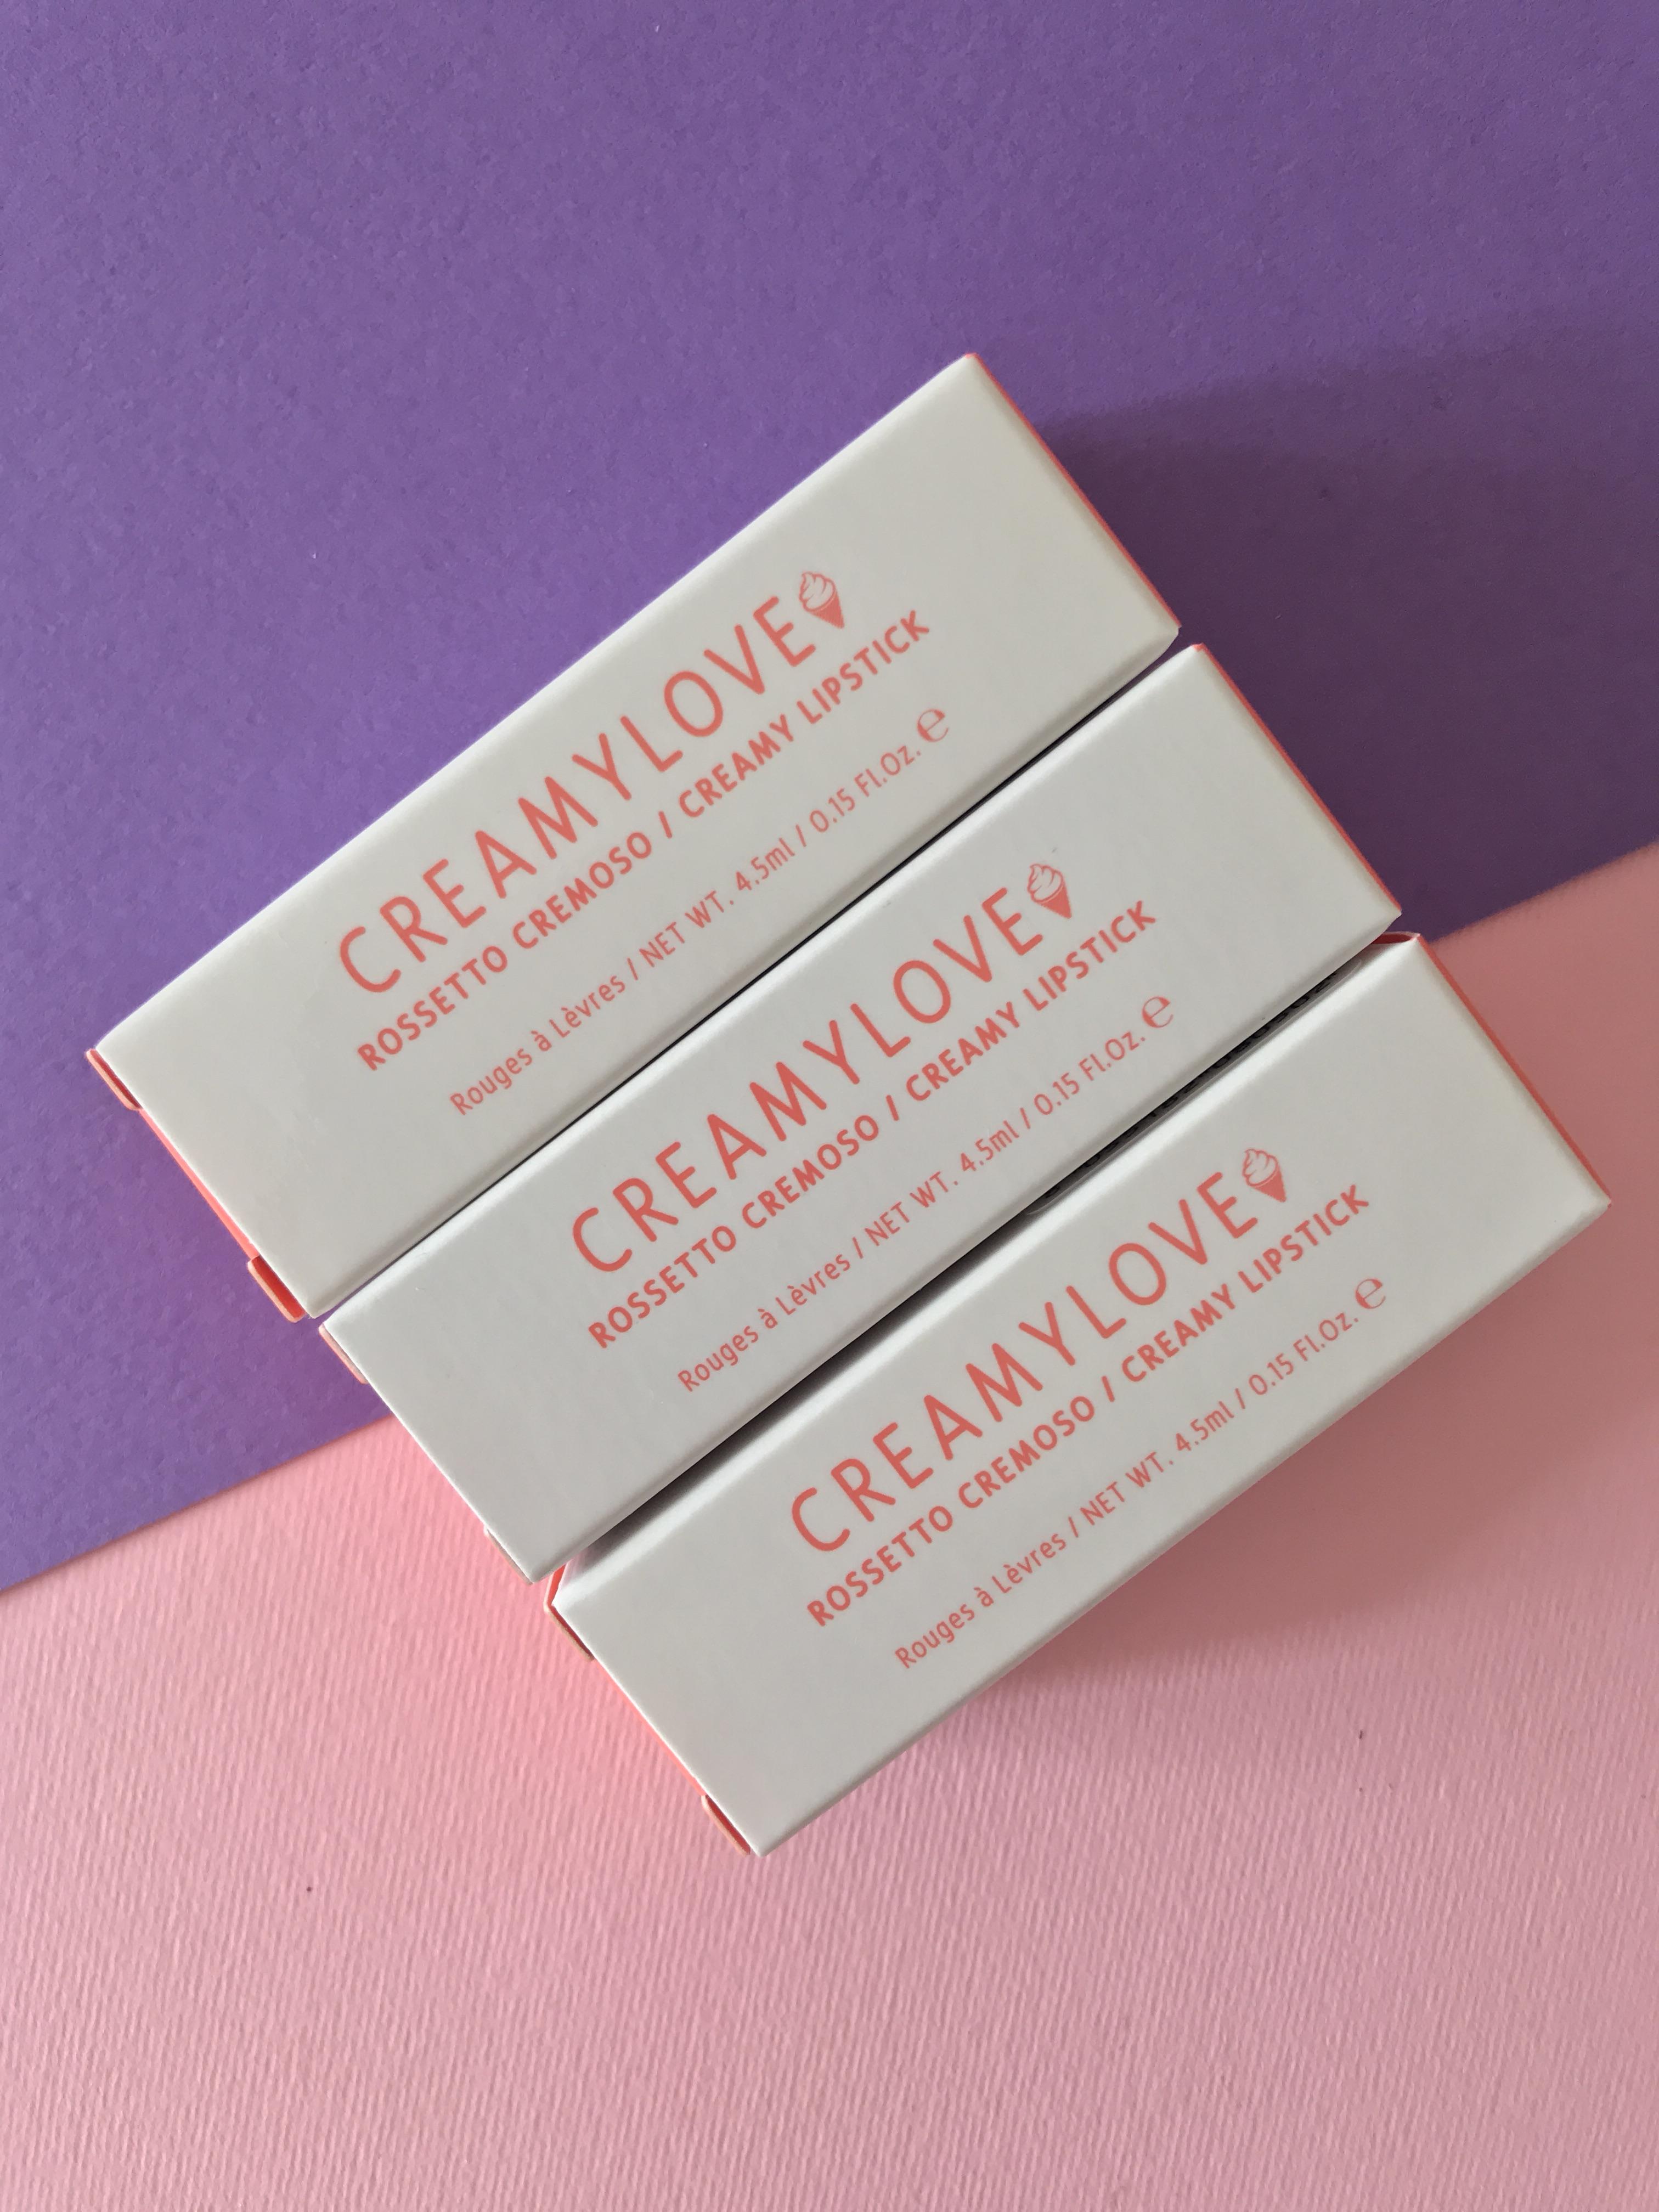 cliomakeupshop creamylove pack.JPG